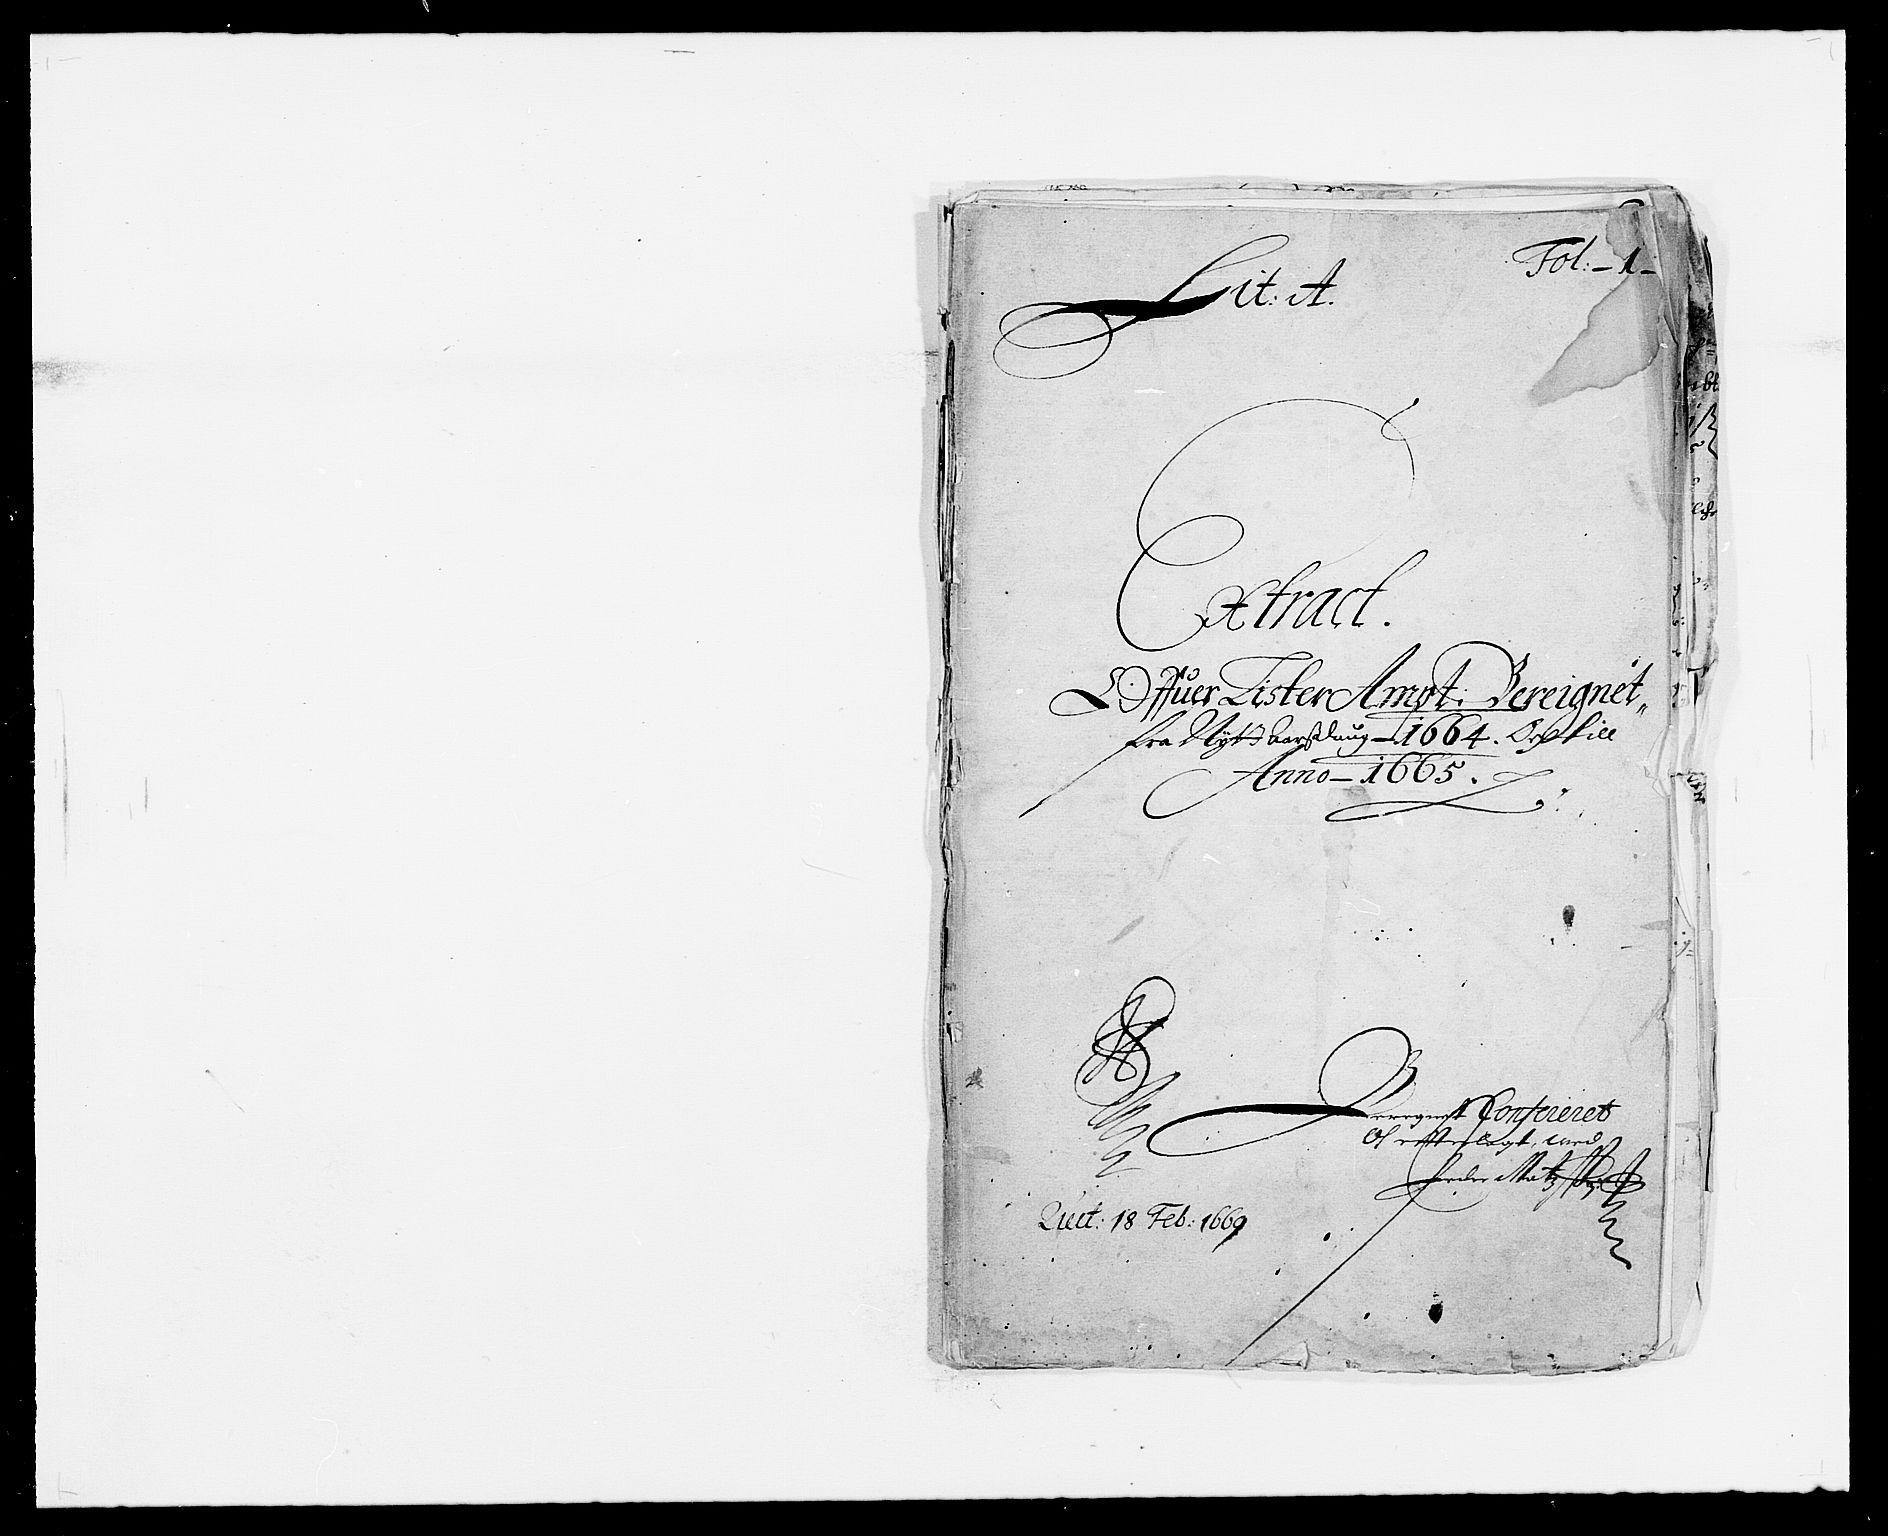 RA, Rentekammeret inntil 1814, Reviderte regnskaper, Fogderegnskap, R41/L2523: Fogderegnskap Lista, 1663-1664, s. 202